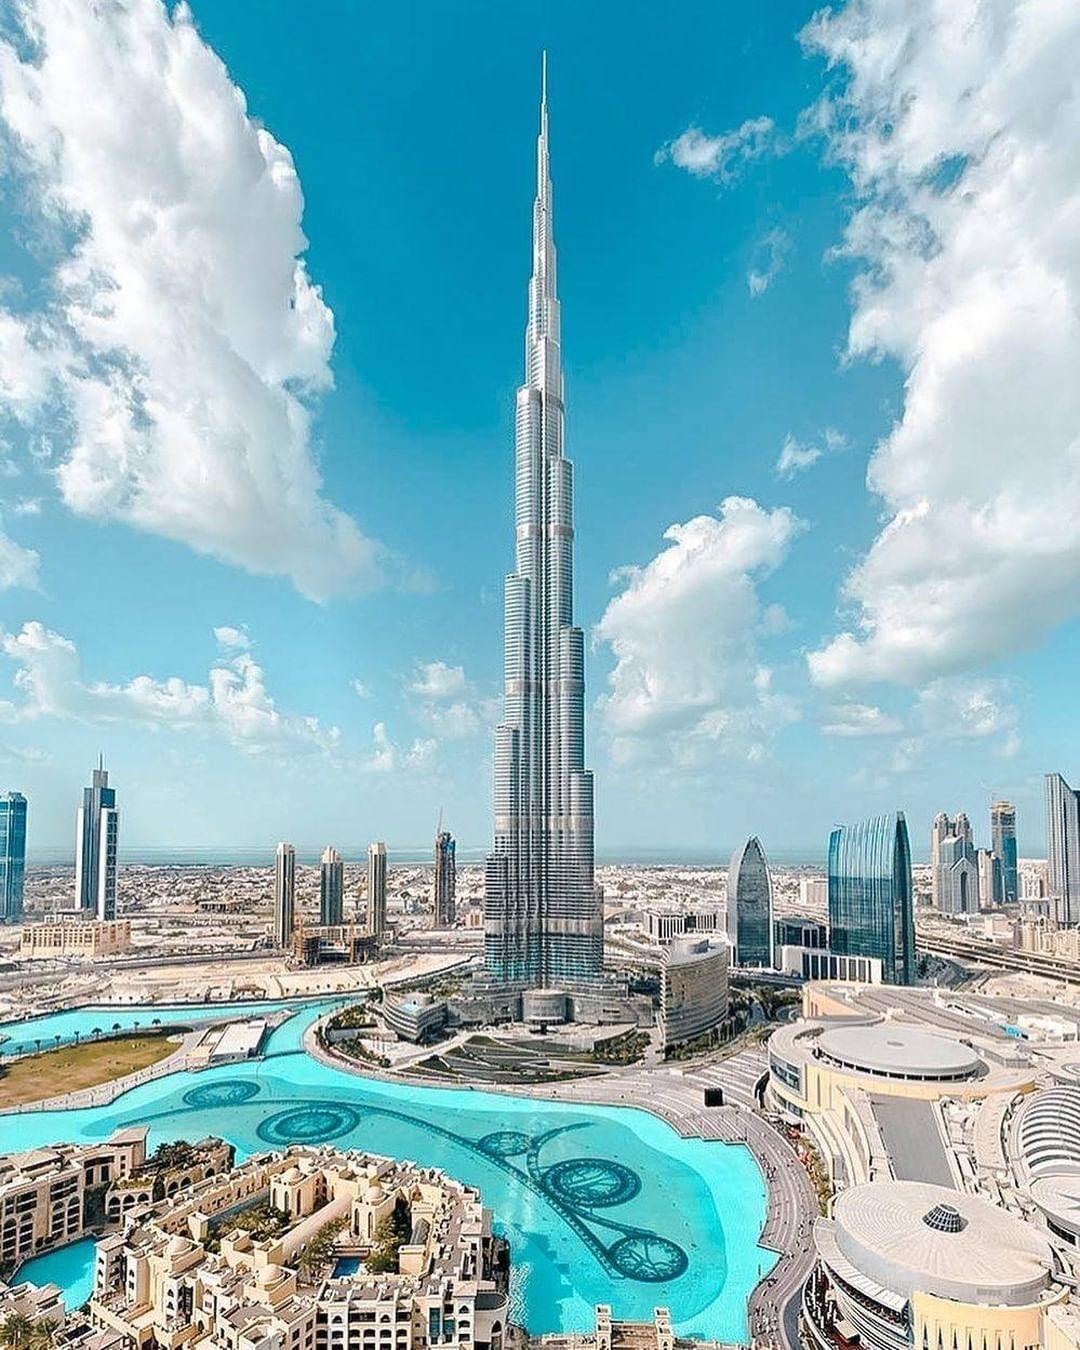 Burj Khalifa Shared A Photo On Instagram قلب دبي ينبض إبداعا وتفر دا برج خليفة An Icon Standing Tall In The Heart Of Dubai Burj Khalifa Dubai Building